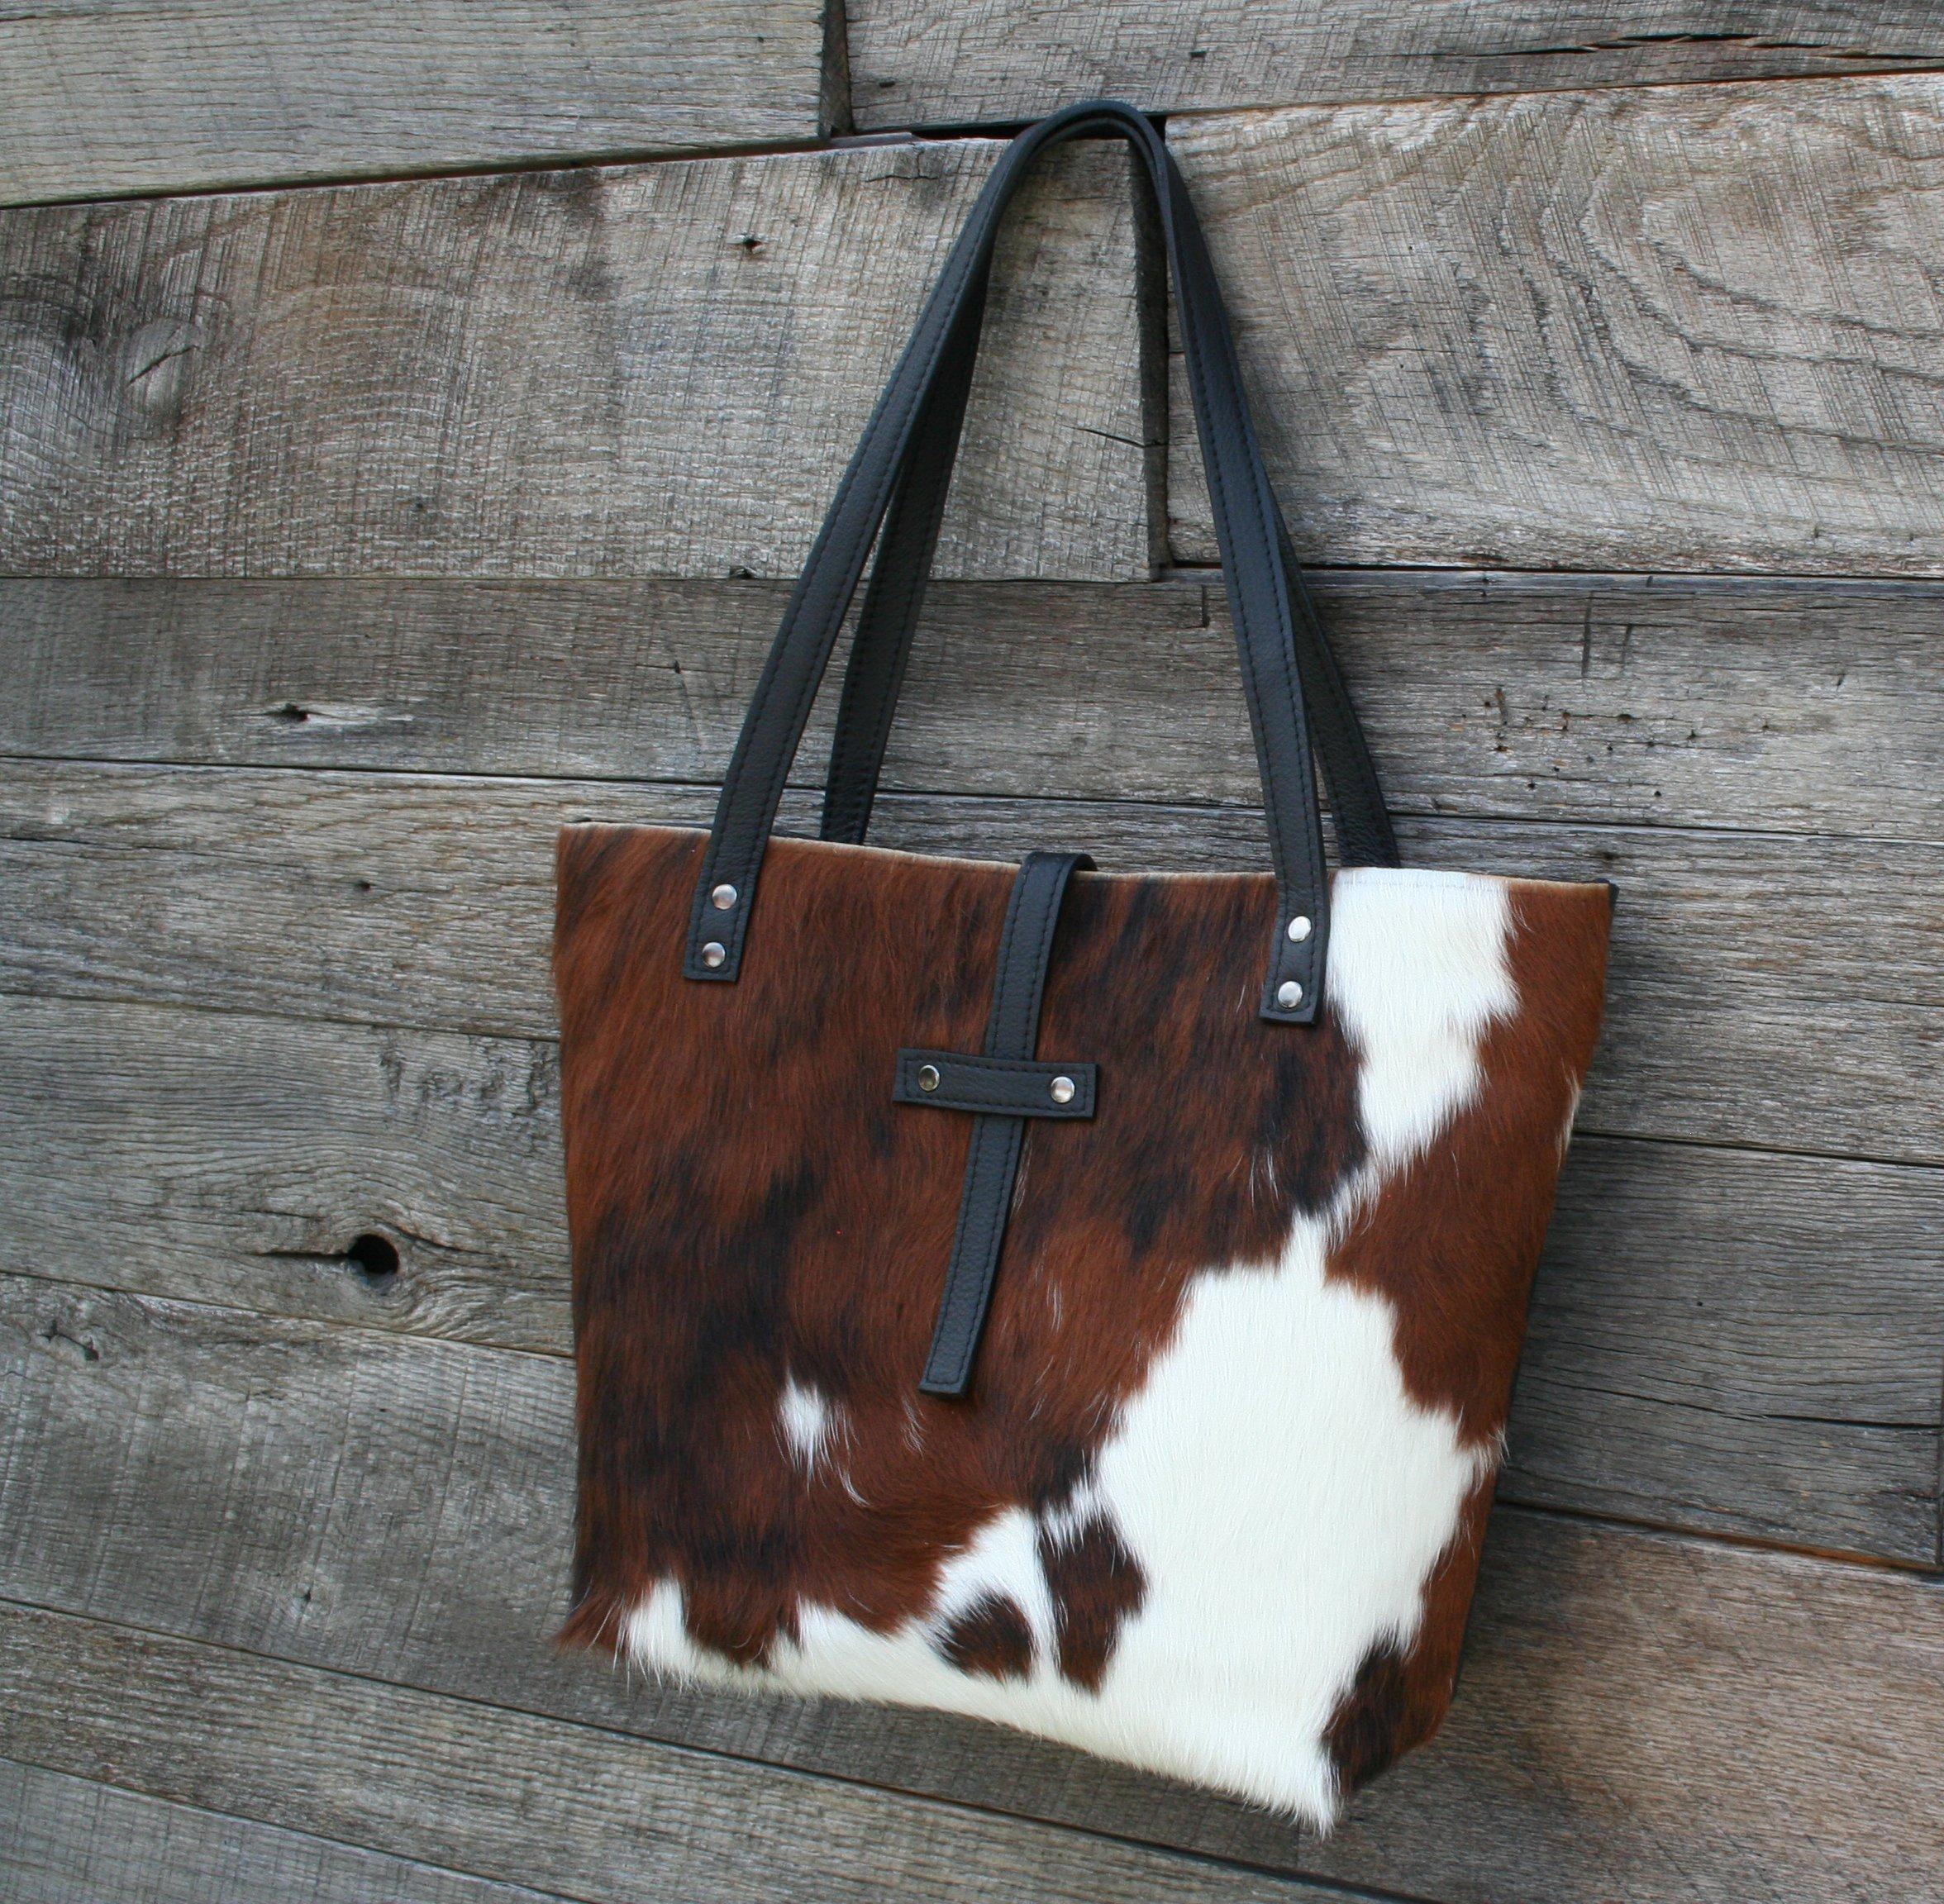 Hair on Hide Tote - Cowhide and Black Leather Bag